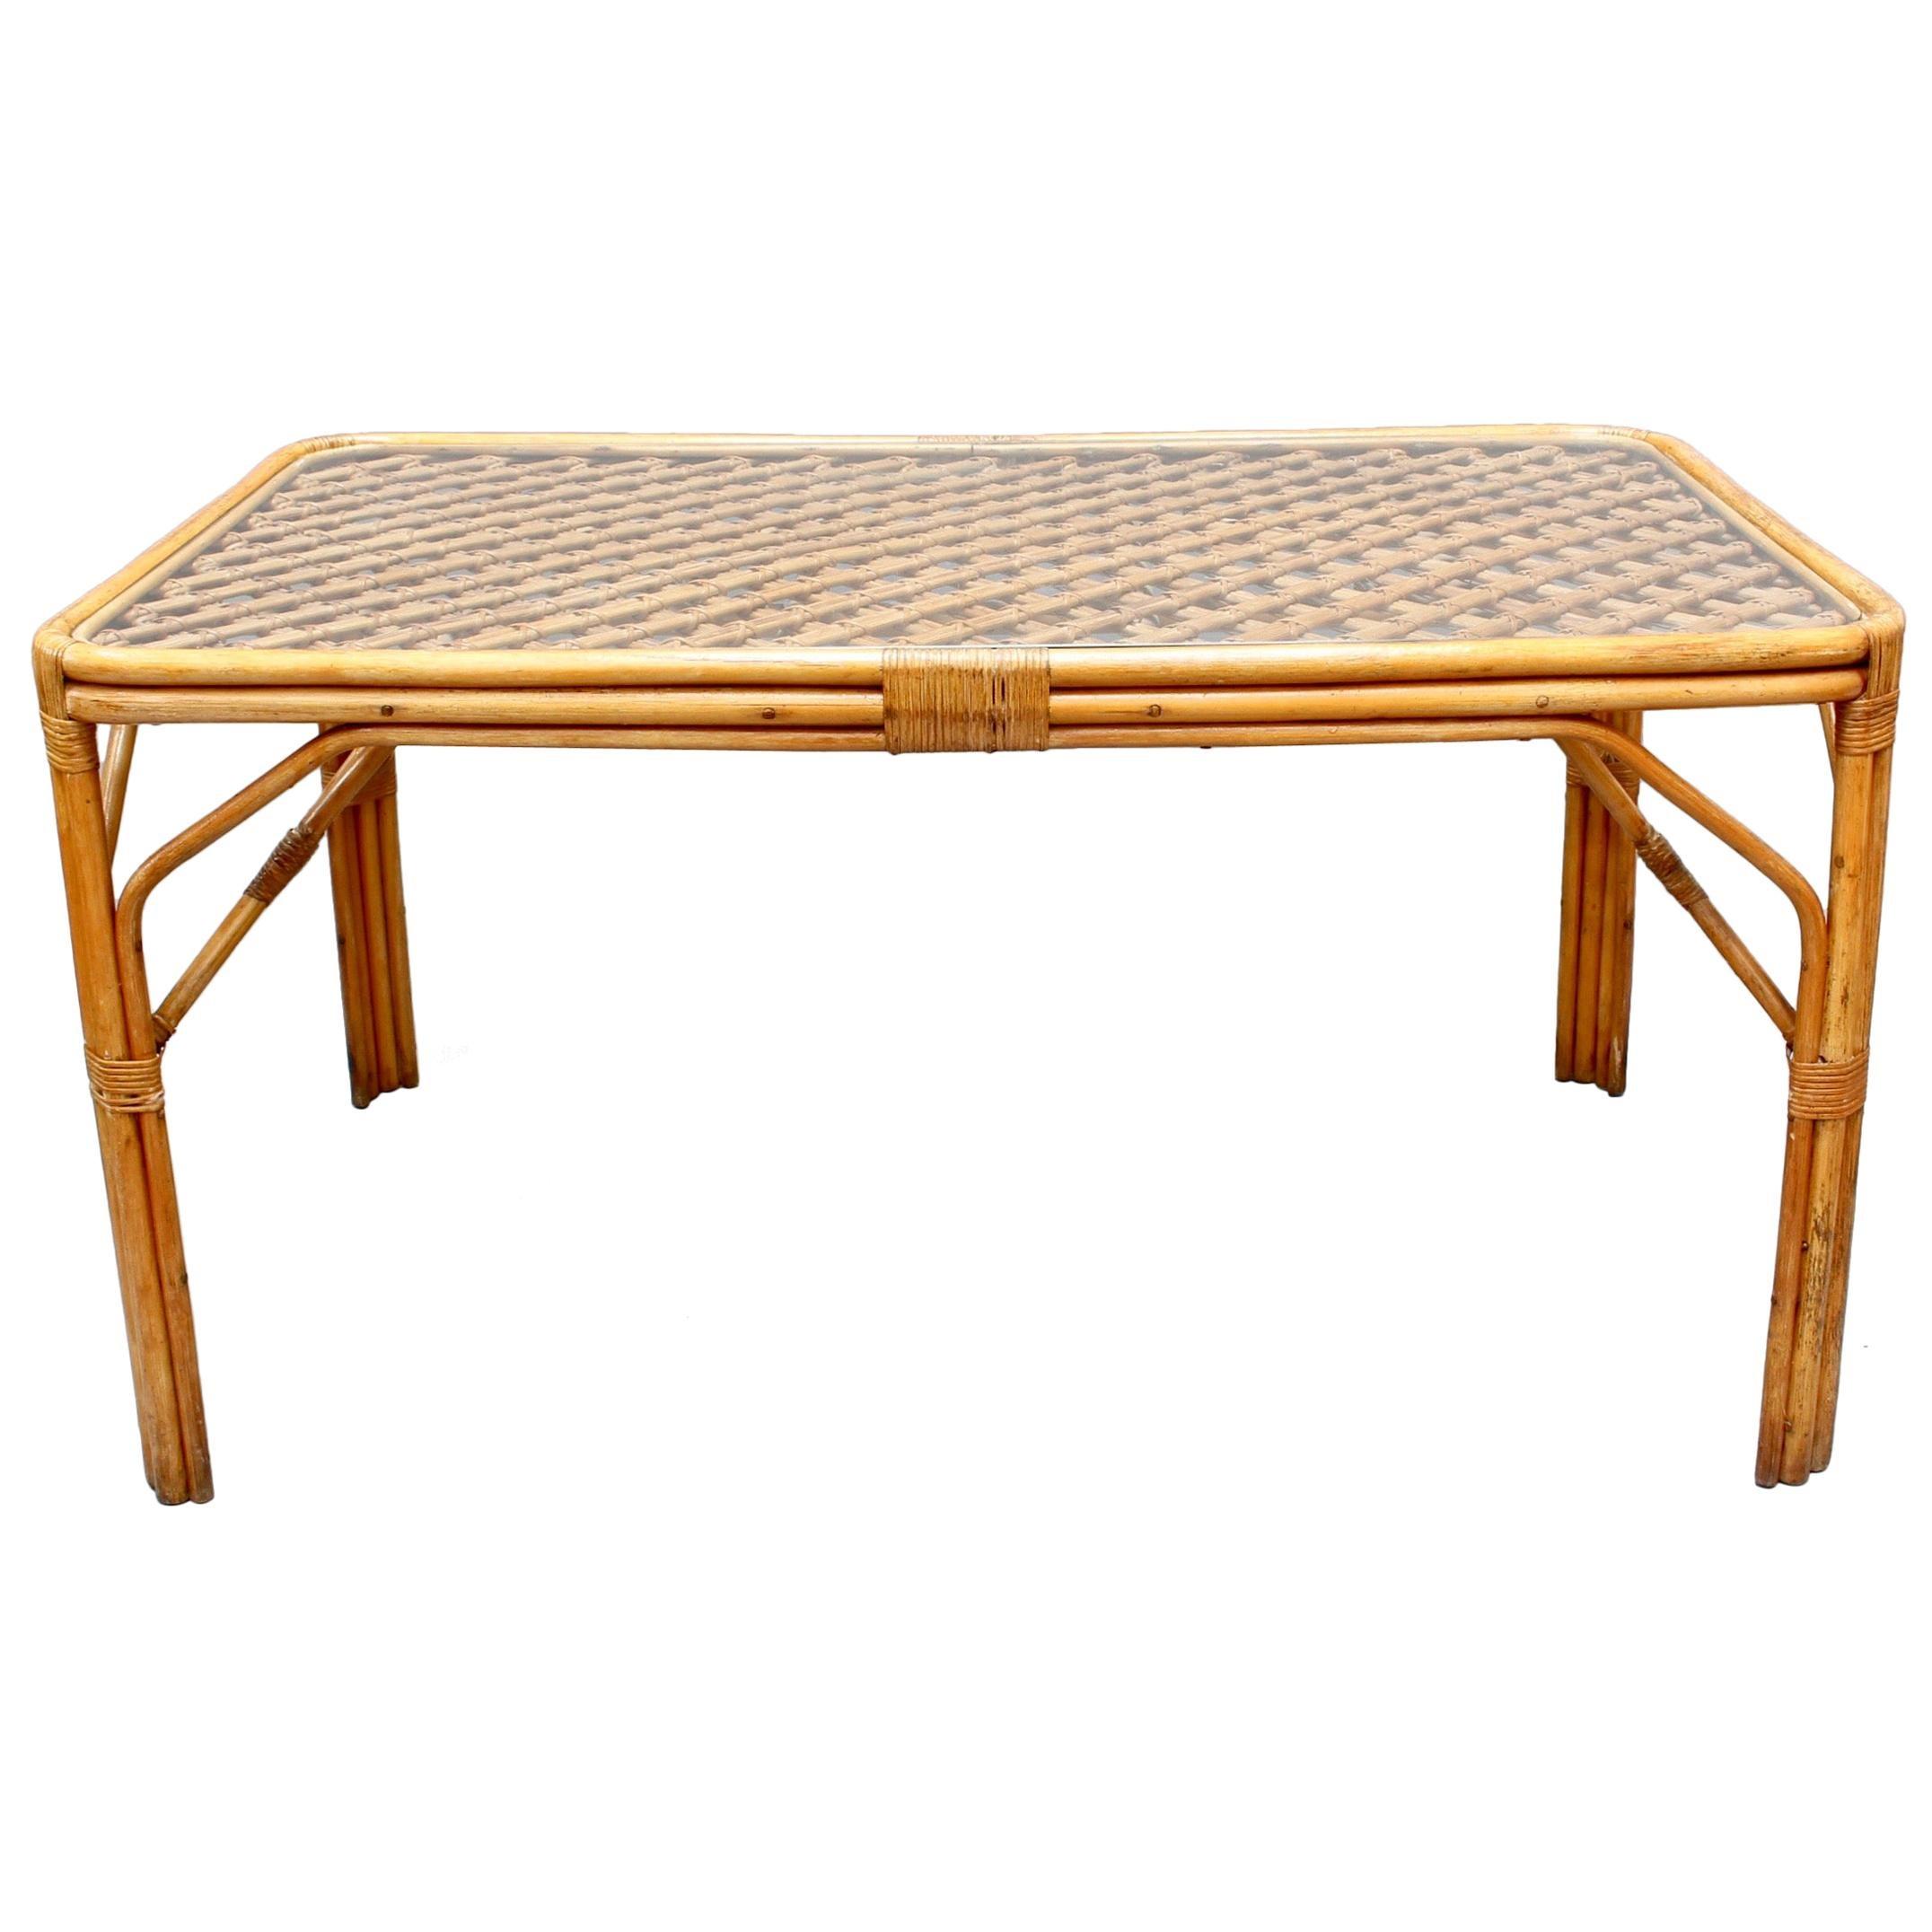 Midcentury Italian Bamboo and Rattan Dining Table, 'circa 1960s'